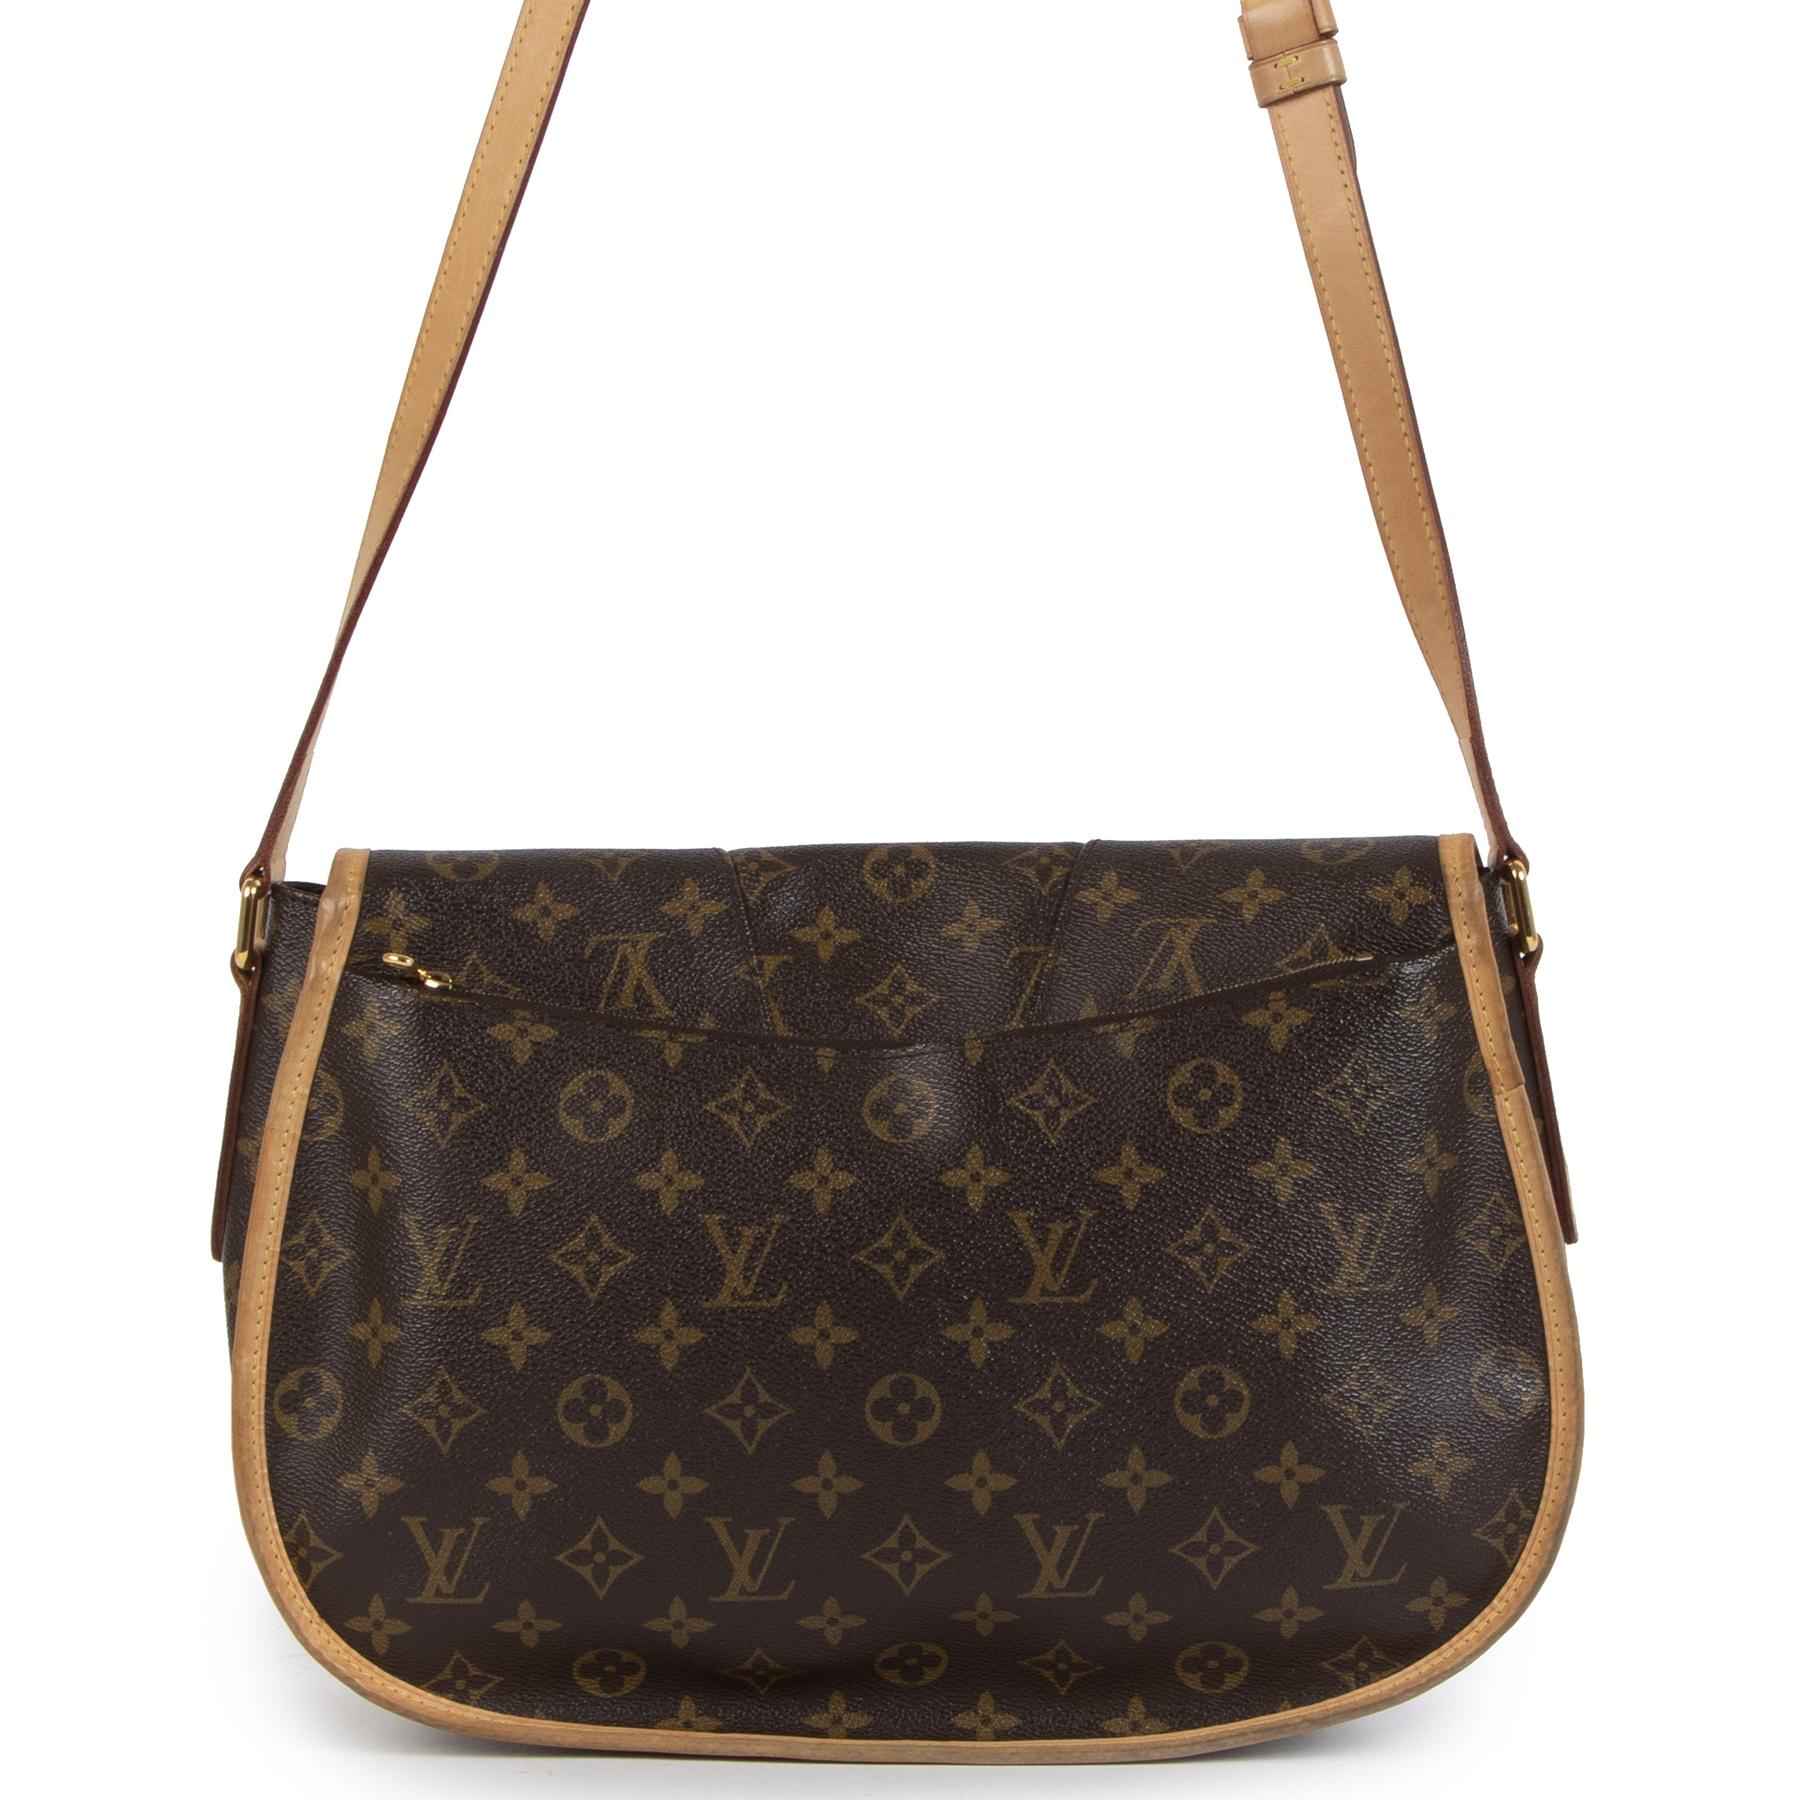 Authentic secondhand Louis Vuitton Menilmontant Monogram MM Bag designer bags accessories pumps luxury vintage webshop safe secure online shopping worldwide shipping